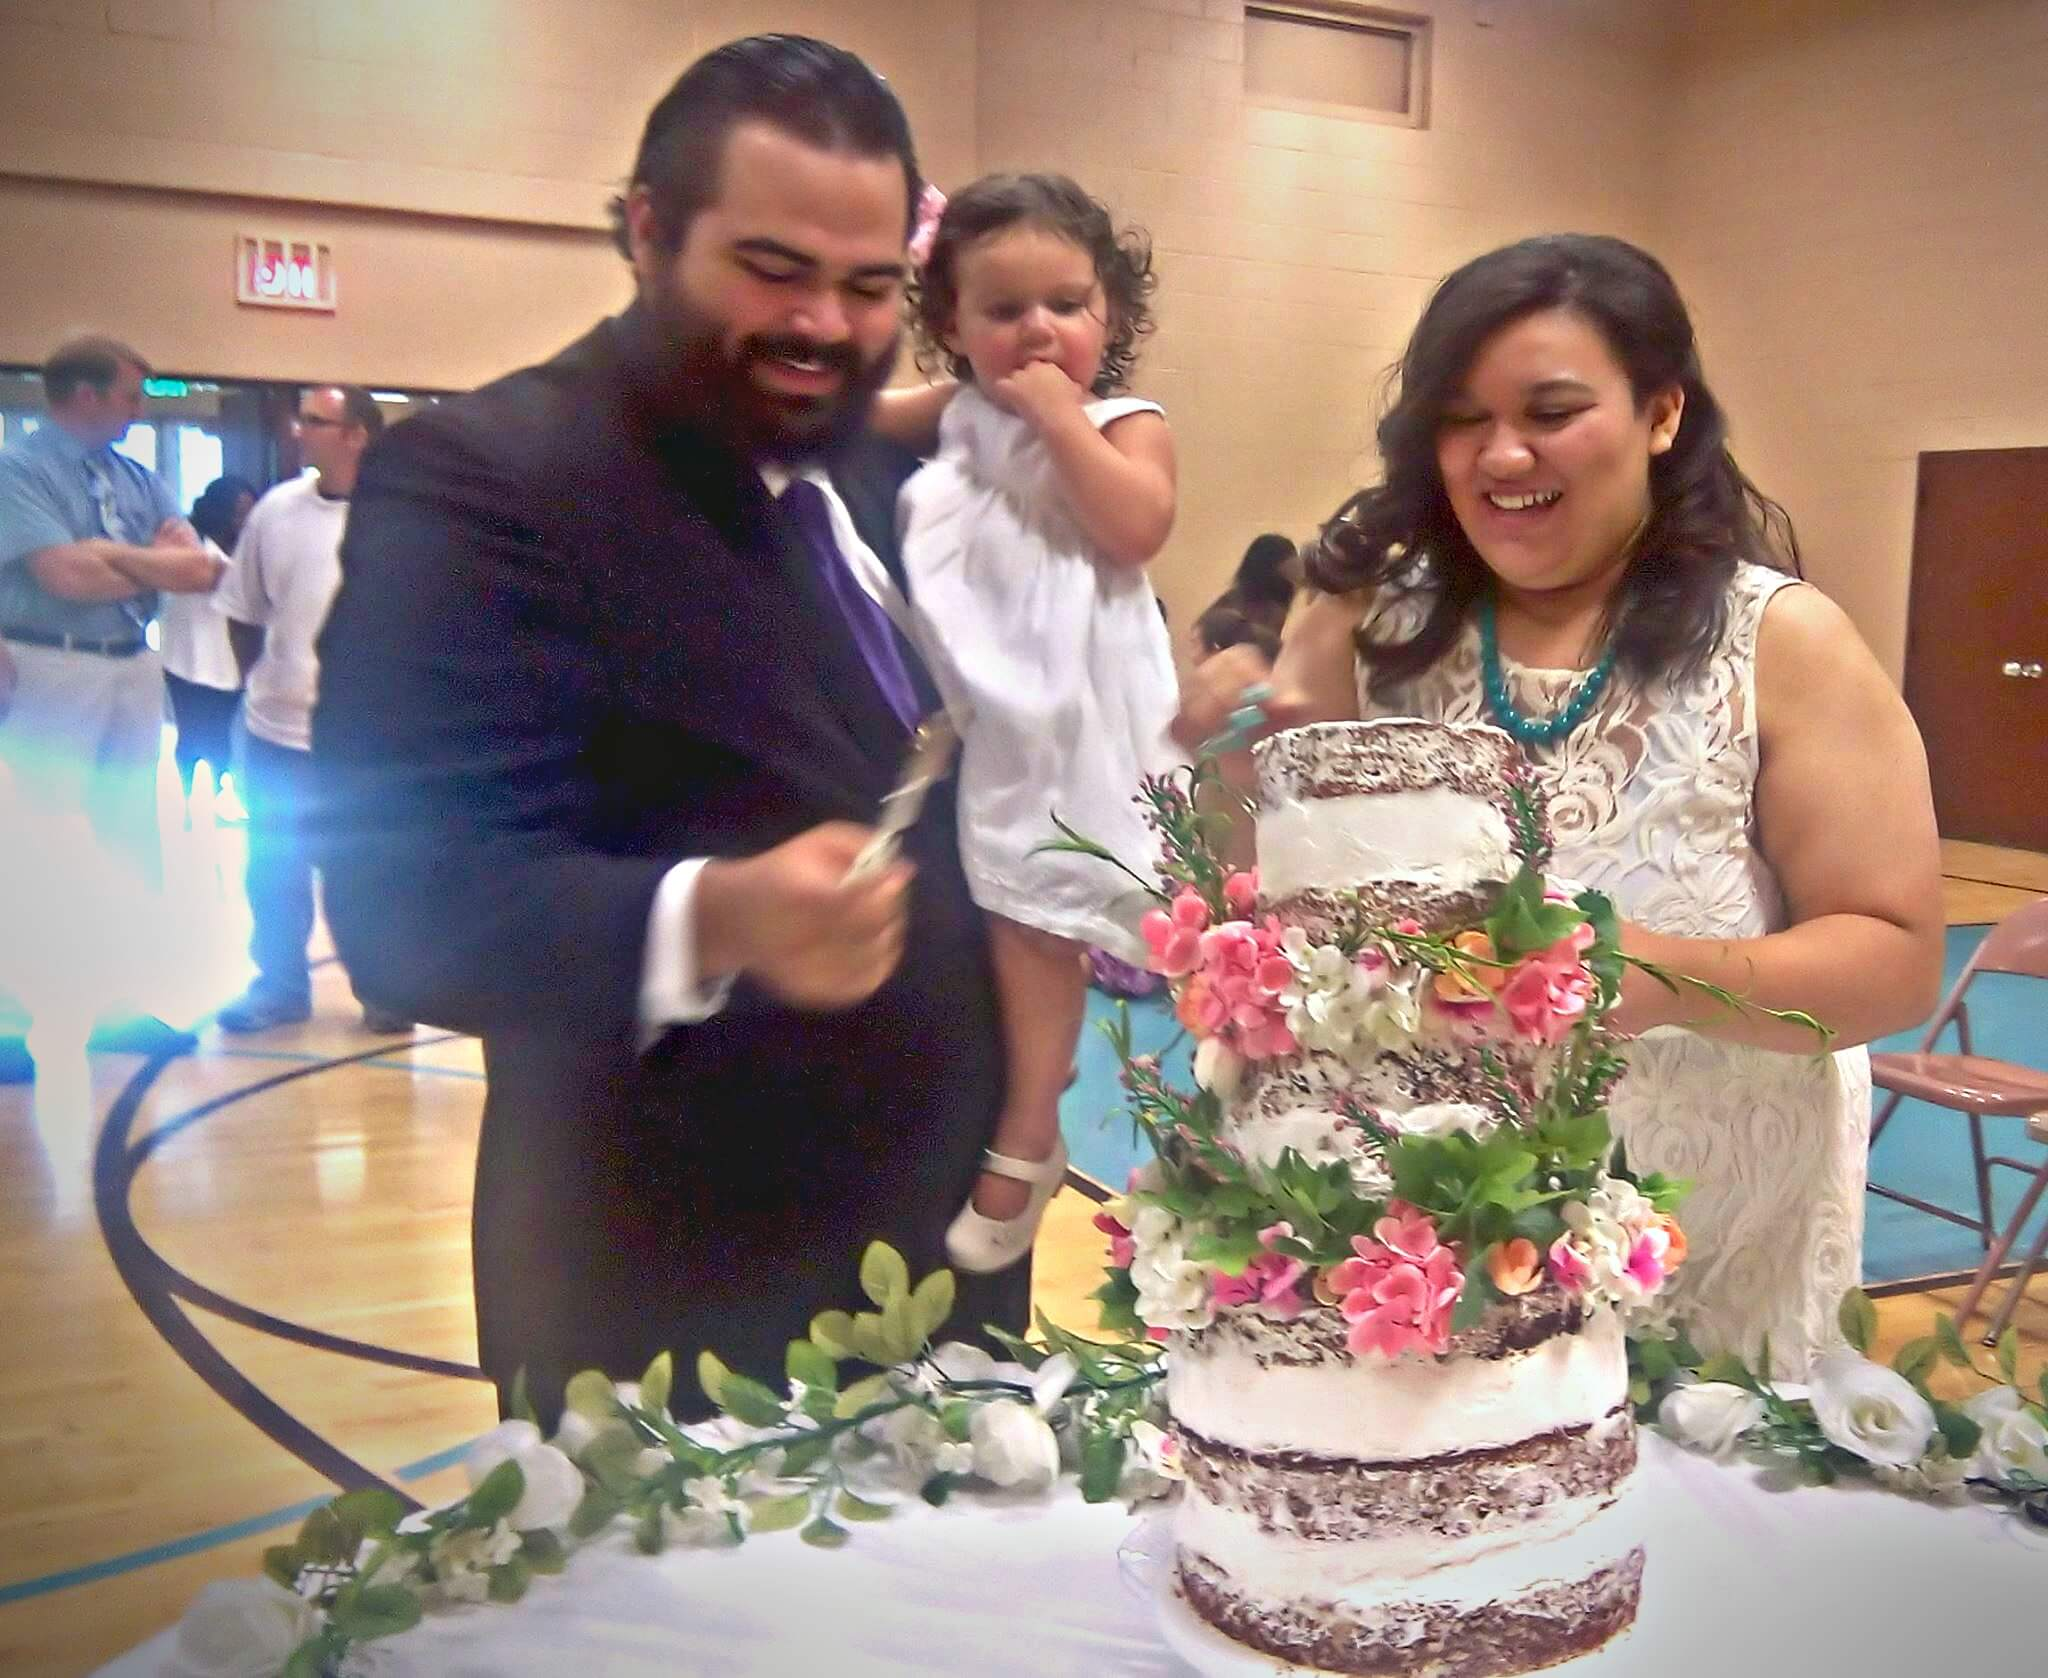 Wedding Photo #4